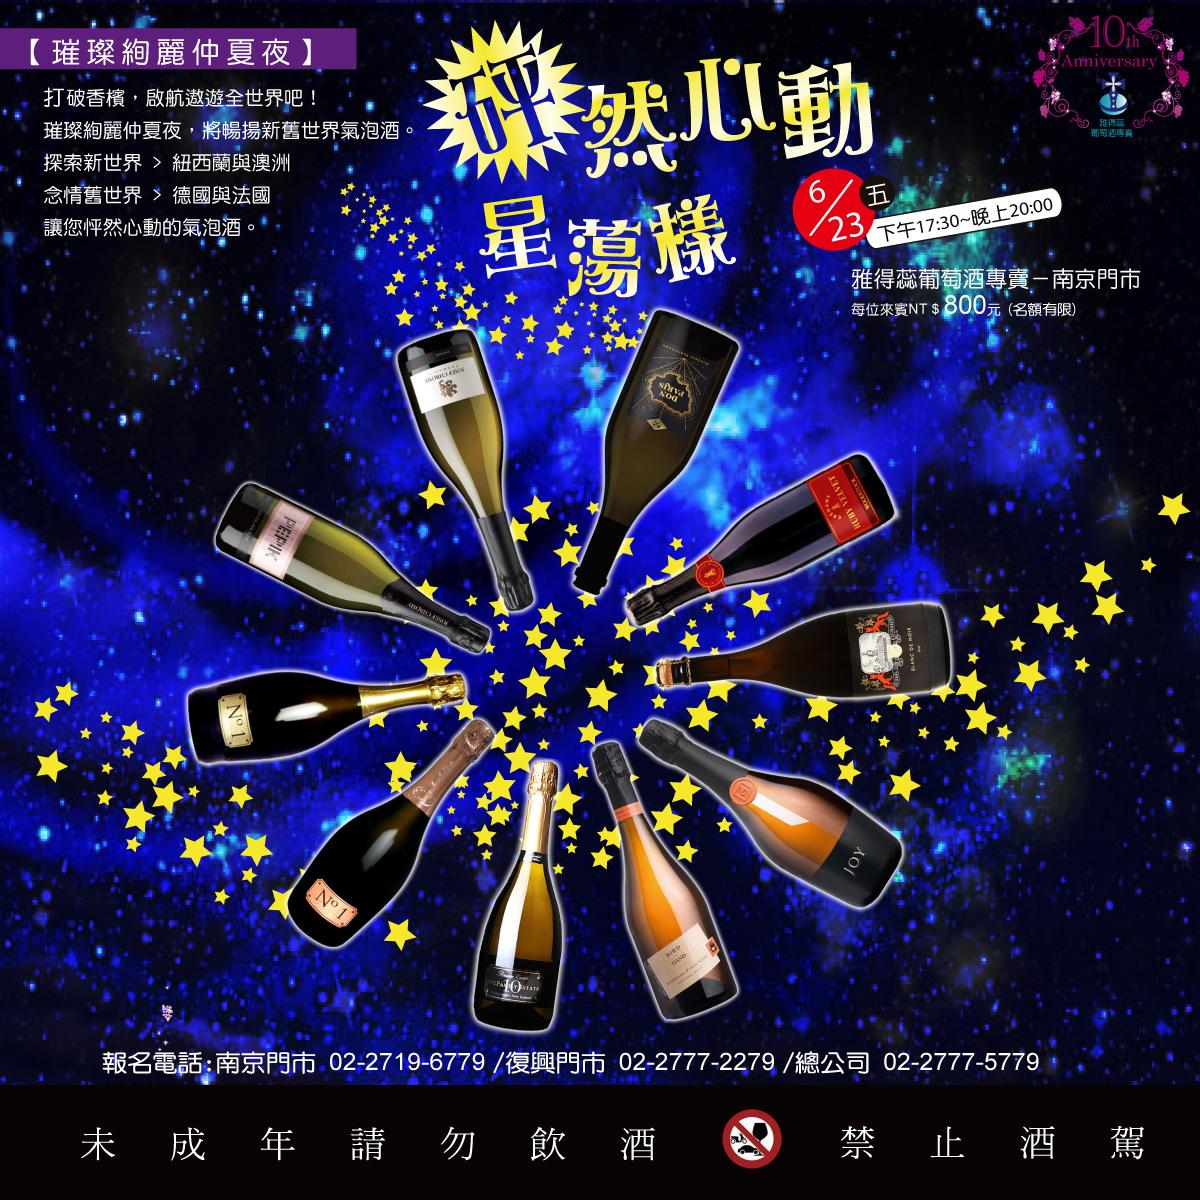 20170623-fb廣告_氣泡酒酒展.jpg